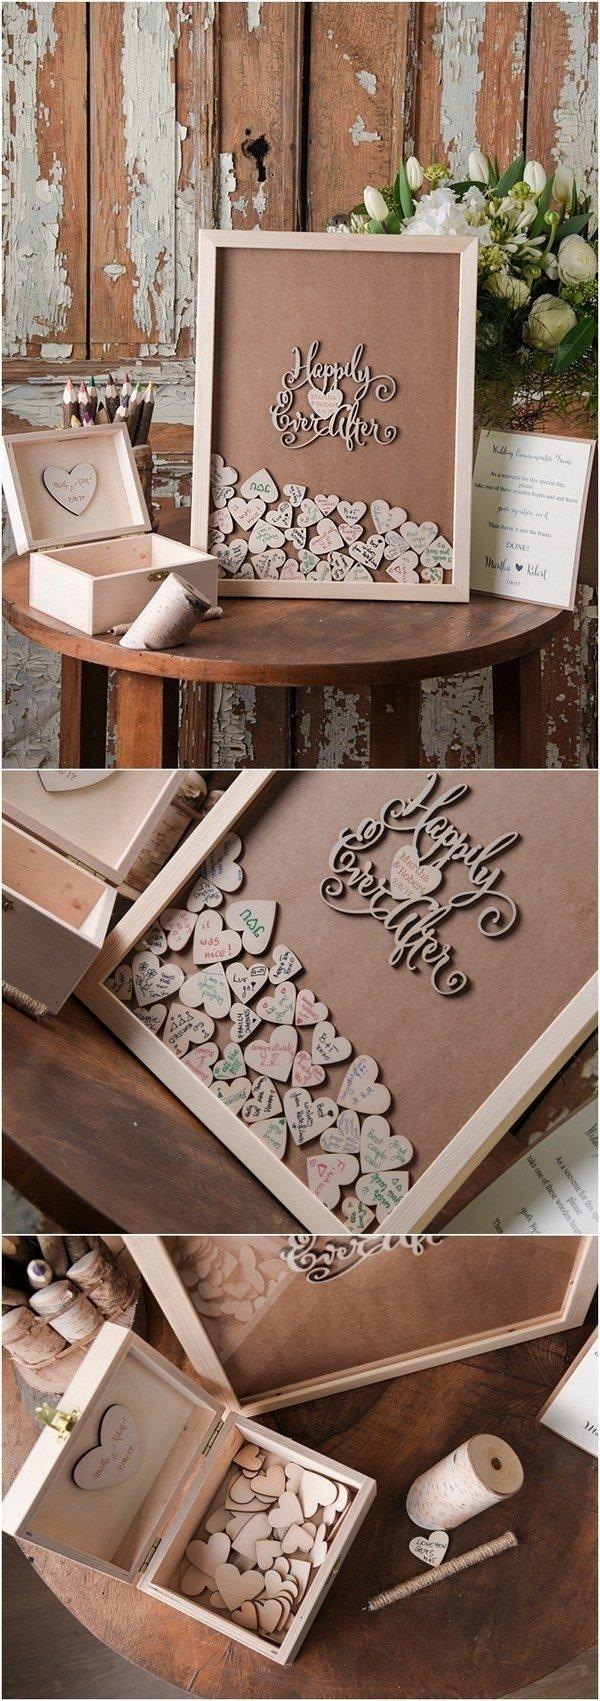 10 Cute Rustic Wedding Guest Book Ideas top 12 rustic wedding guest books botanical wedding invitations 4 2020